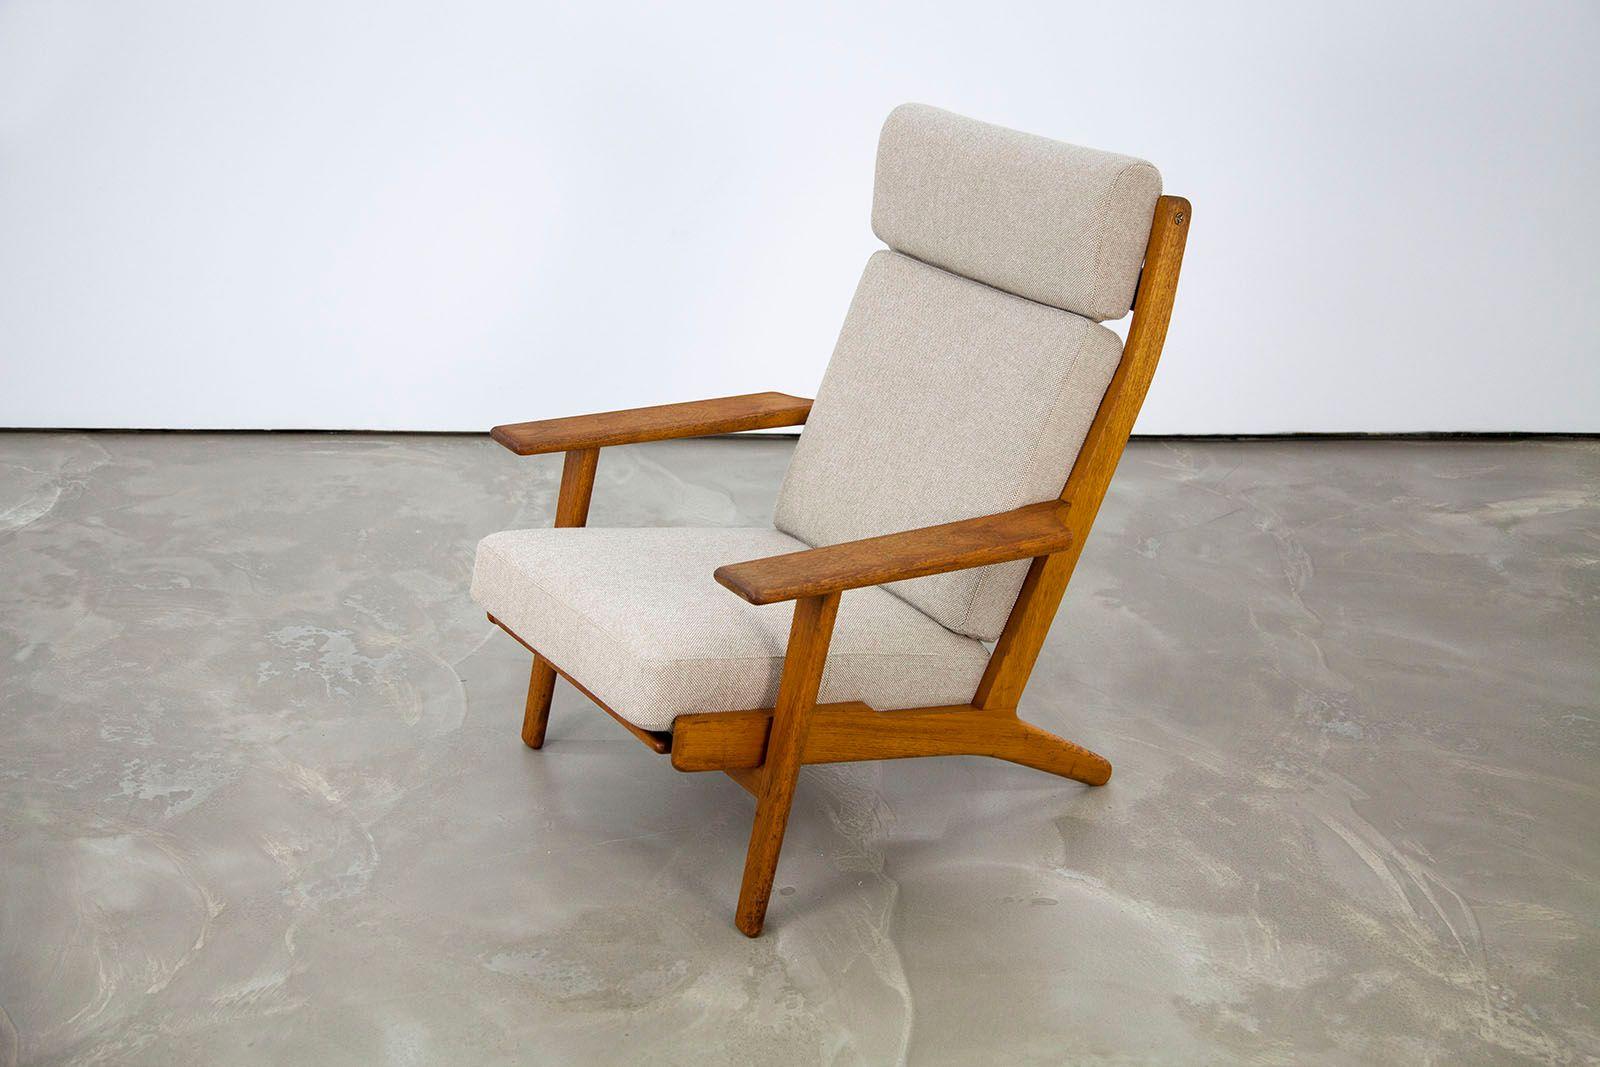 ge 290 easy chair by hans j wegner for getama for sale at pamono. Black Bedroom Furniture Sets. Home Design Ideas